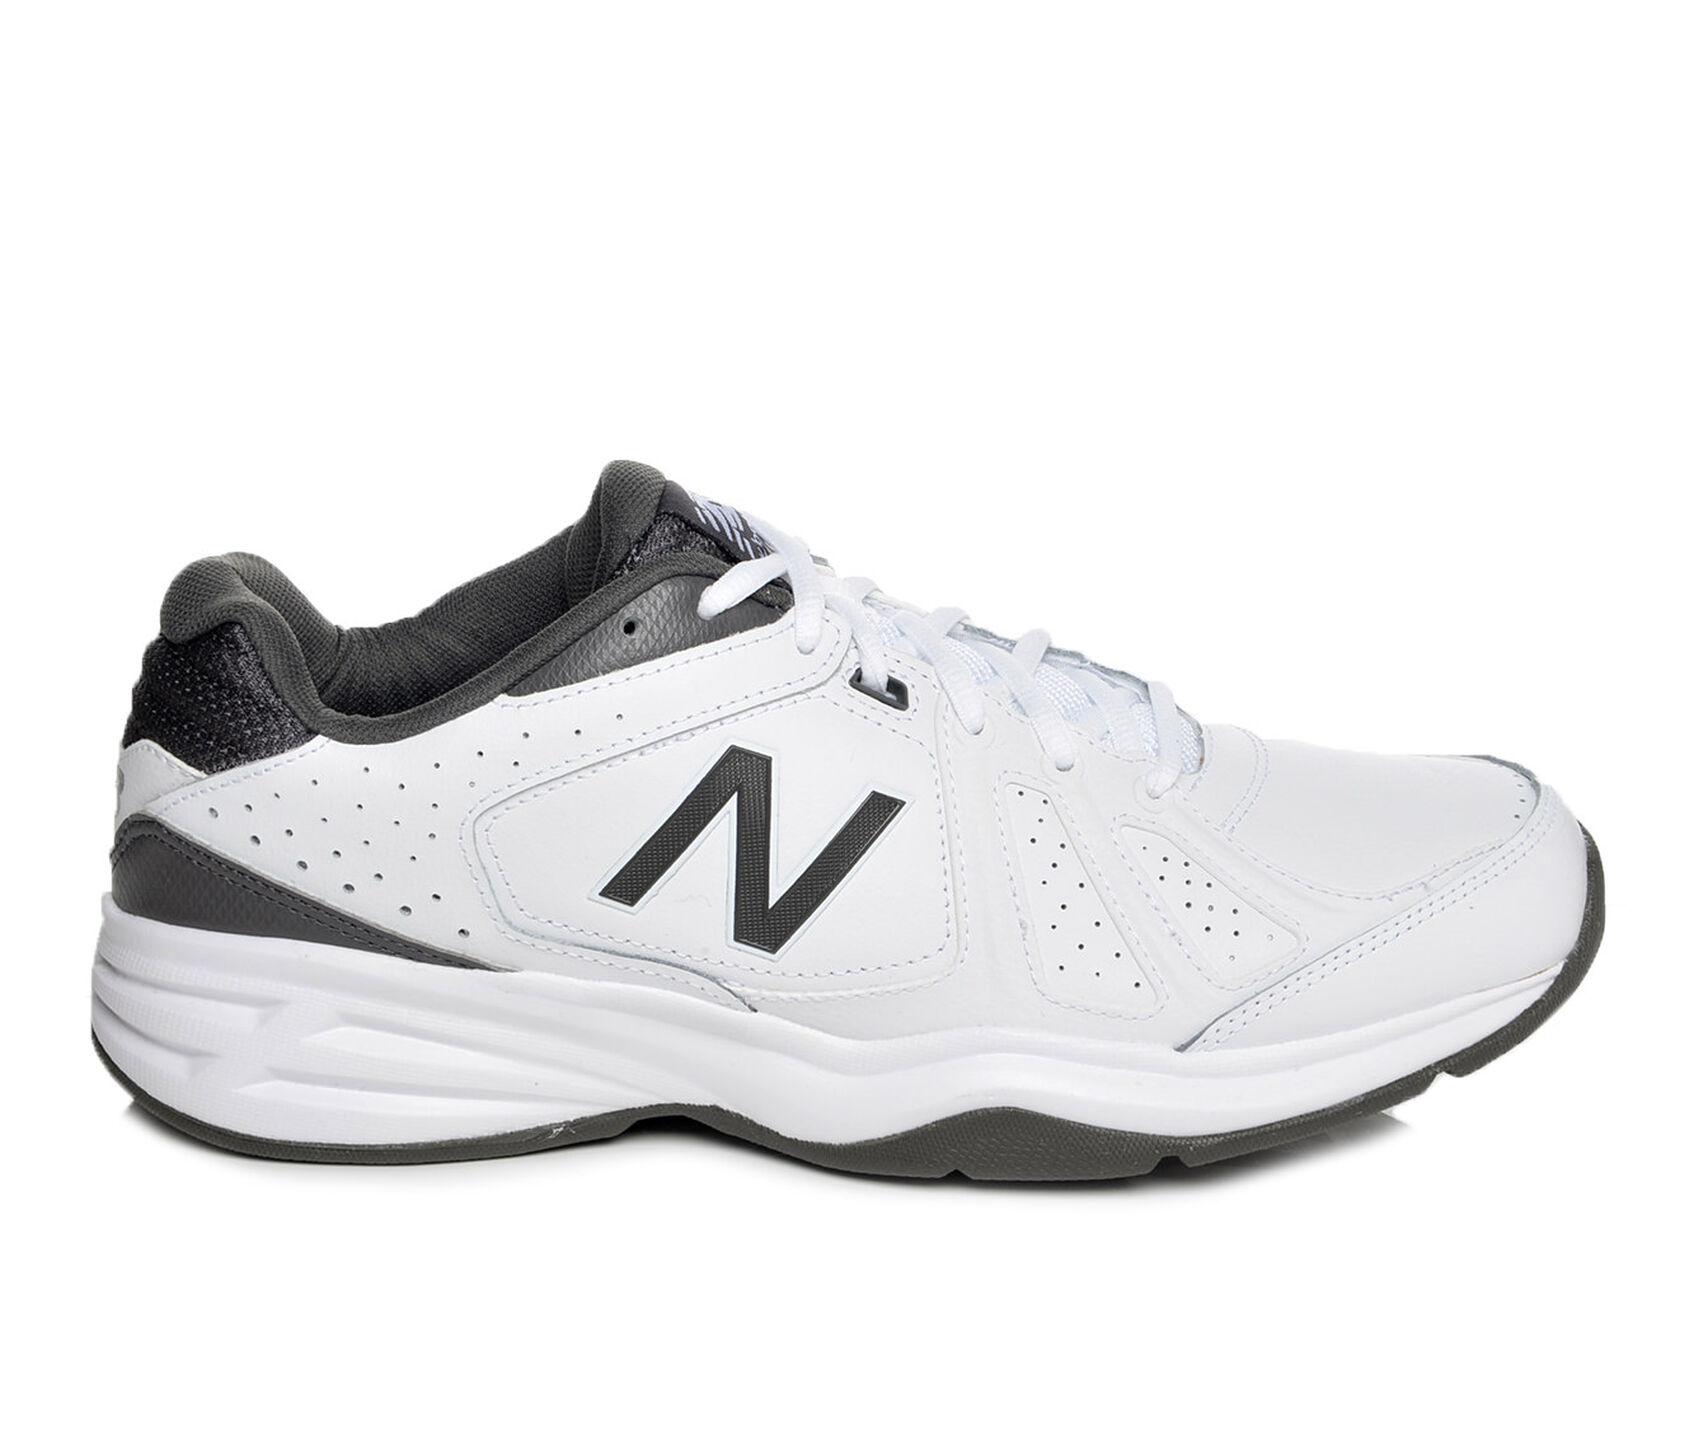 Shoe Carnival New Balance